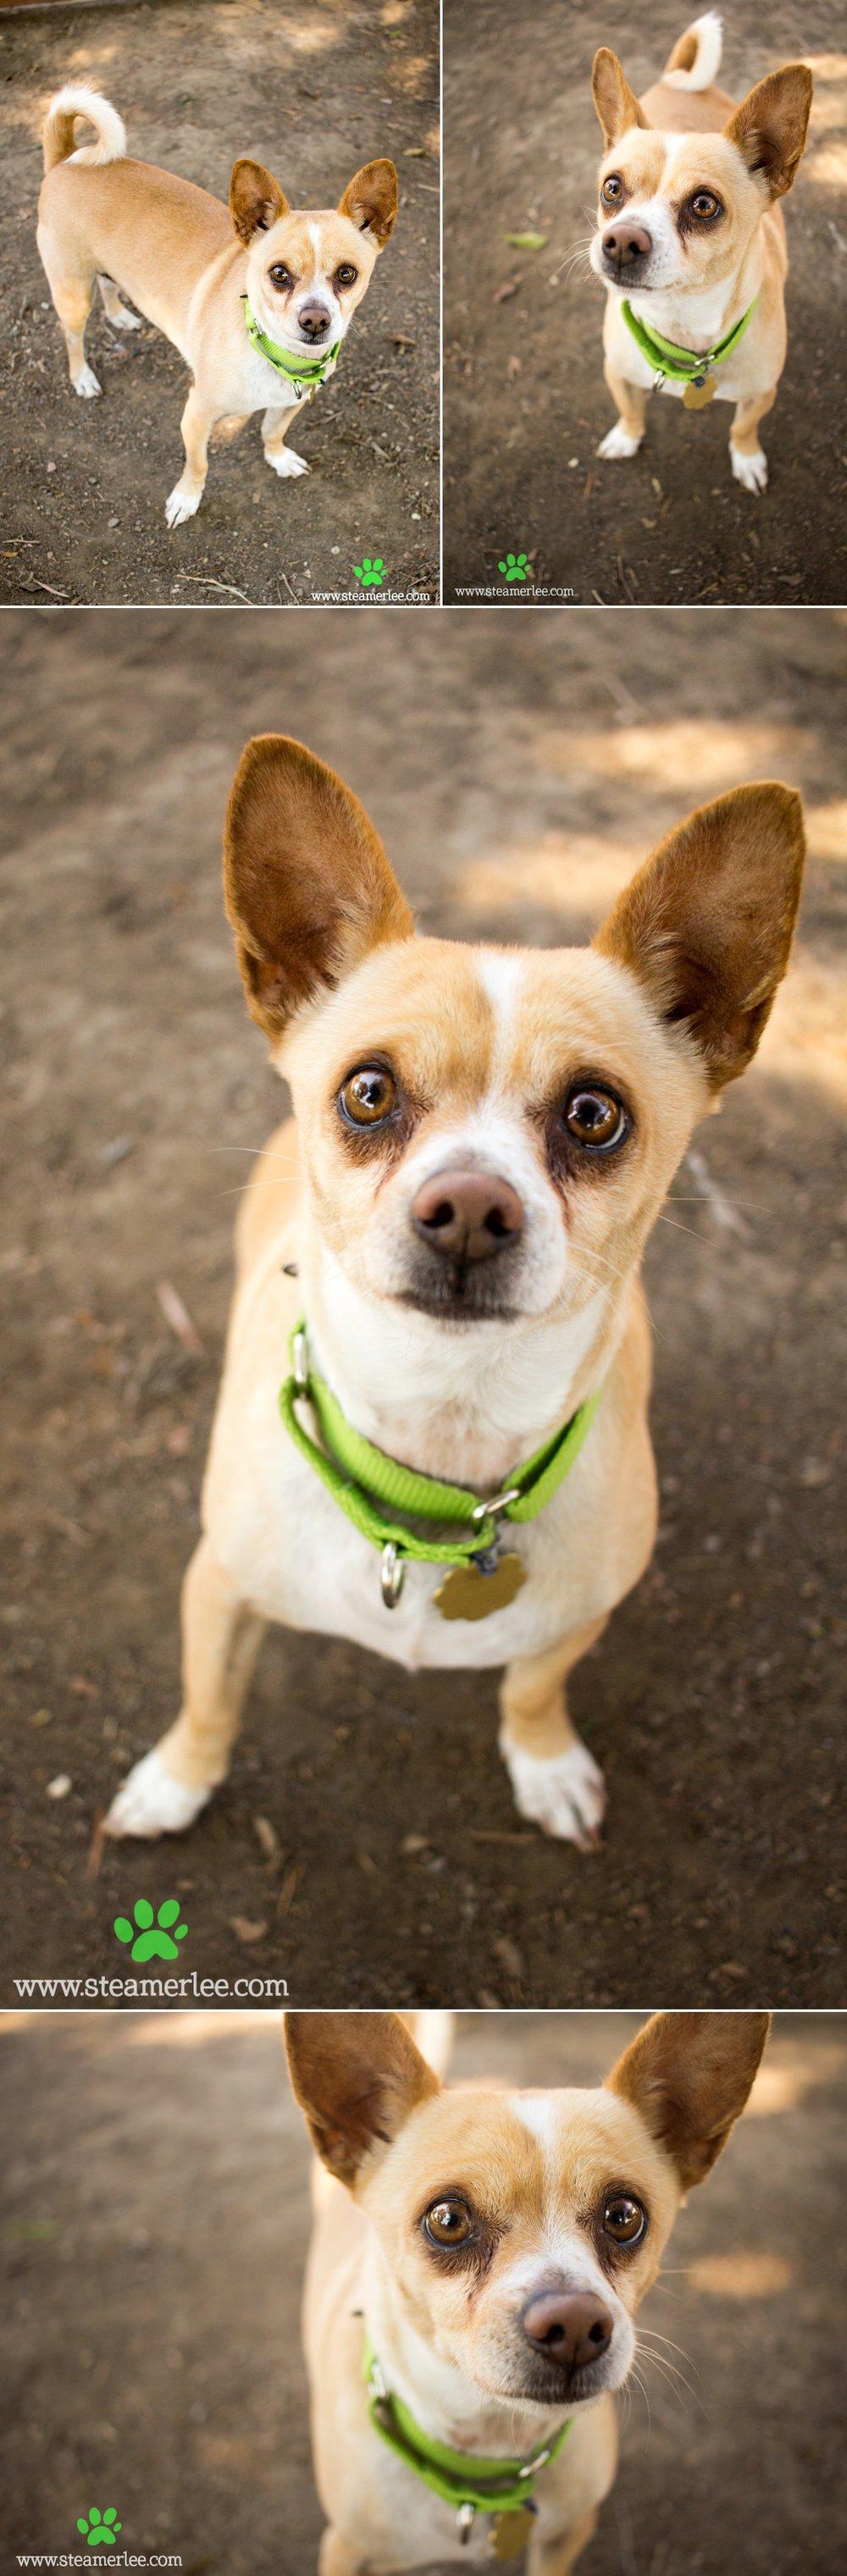 12 Steamer Lee Dog Photography - Seal Beach Animal Care Center.JPG